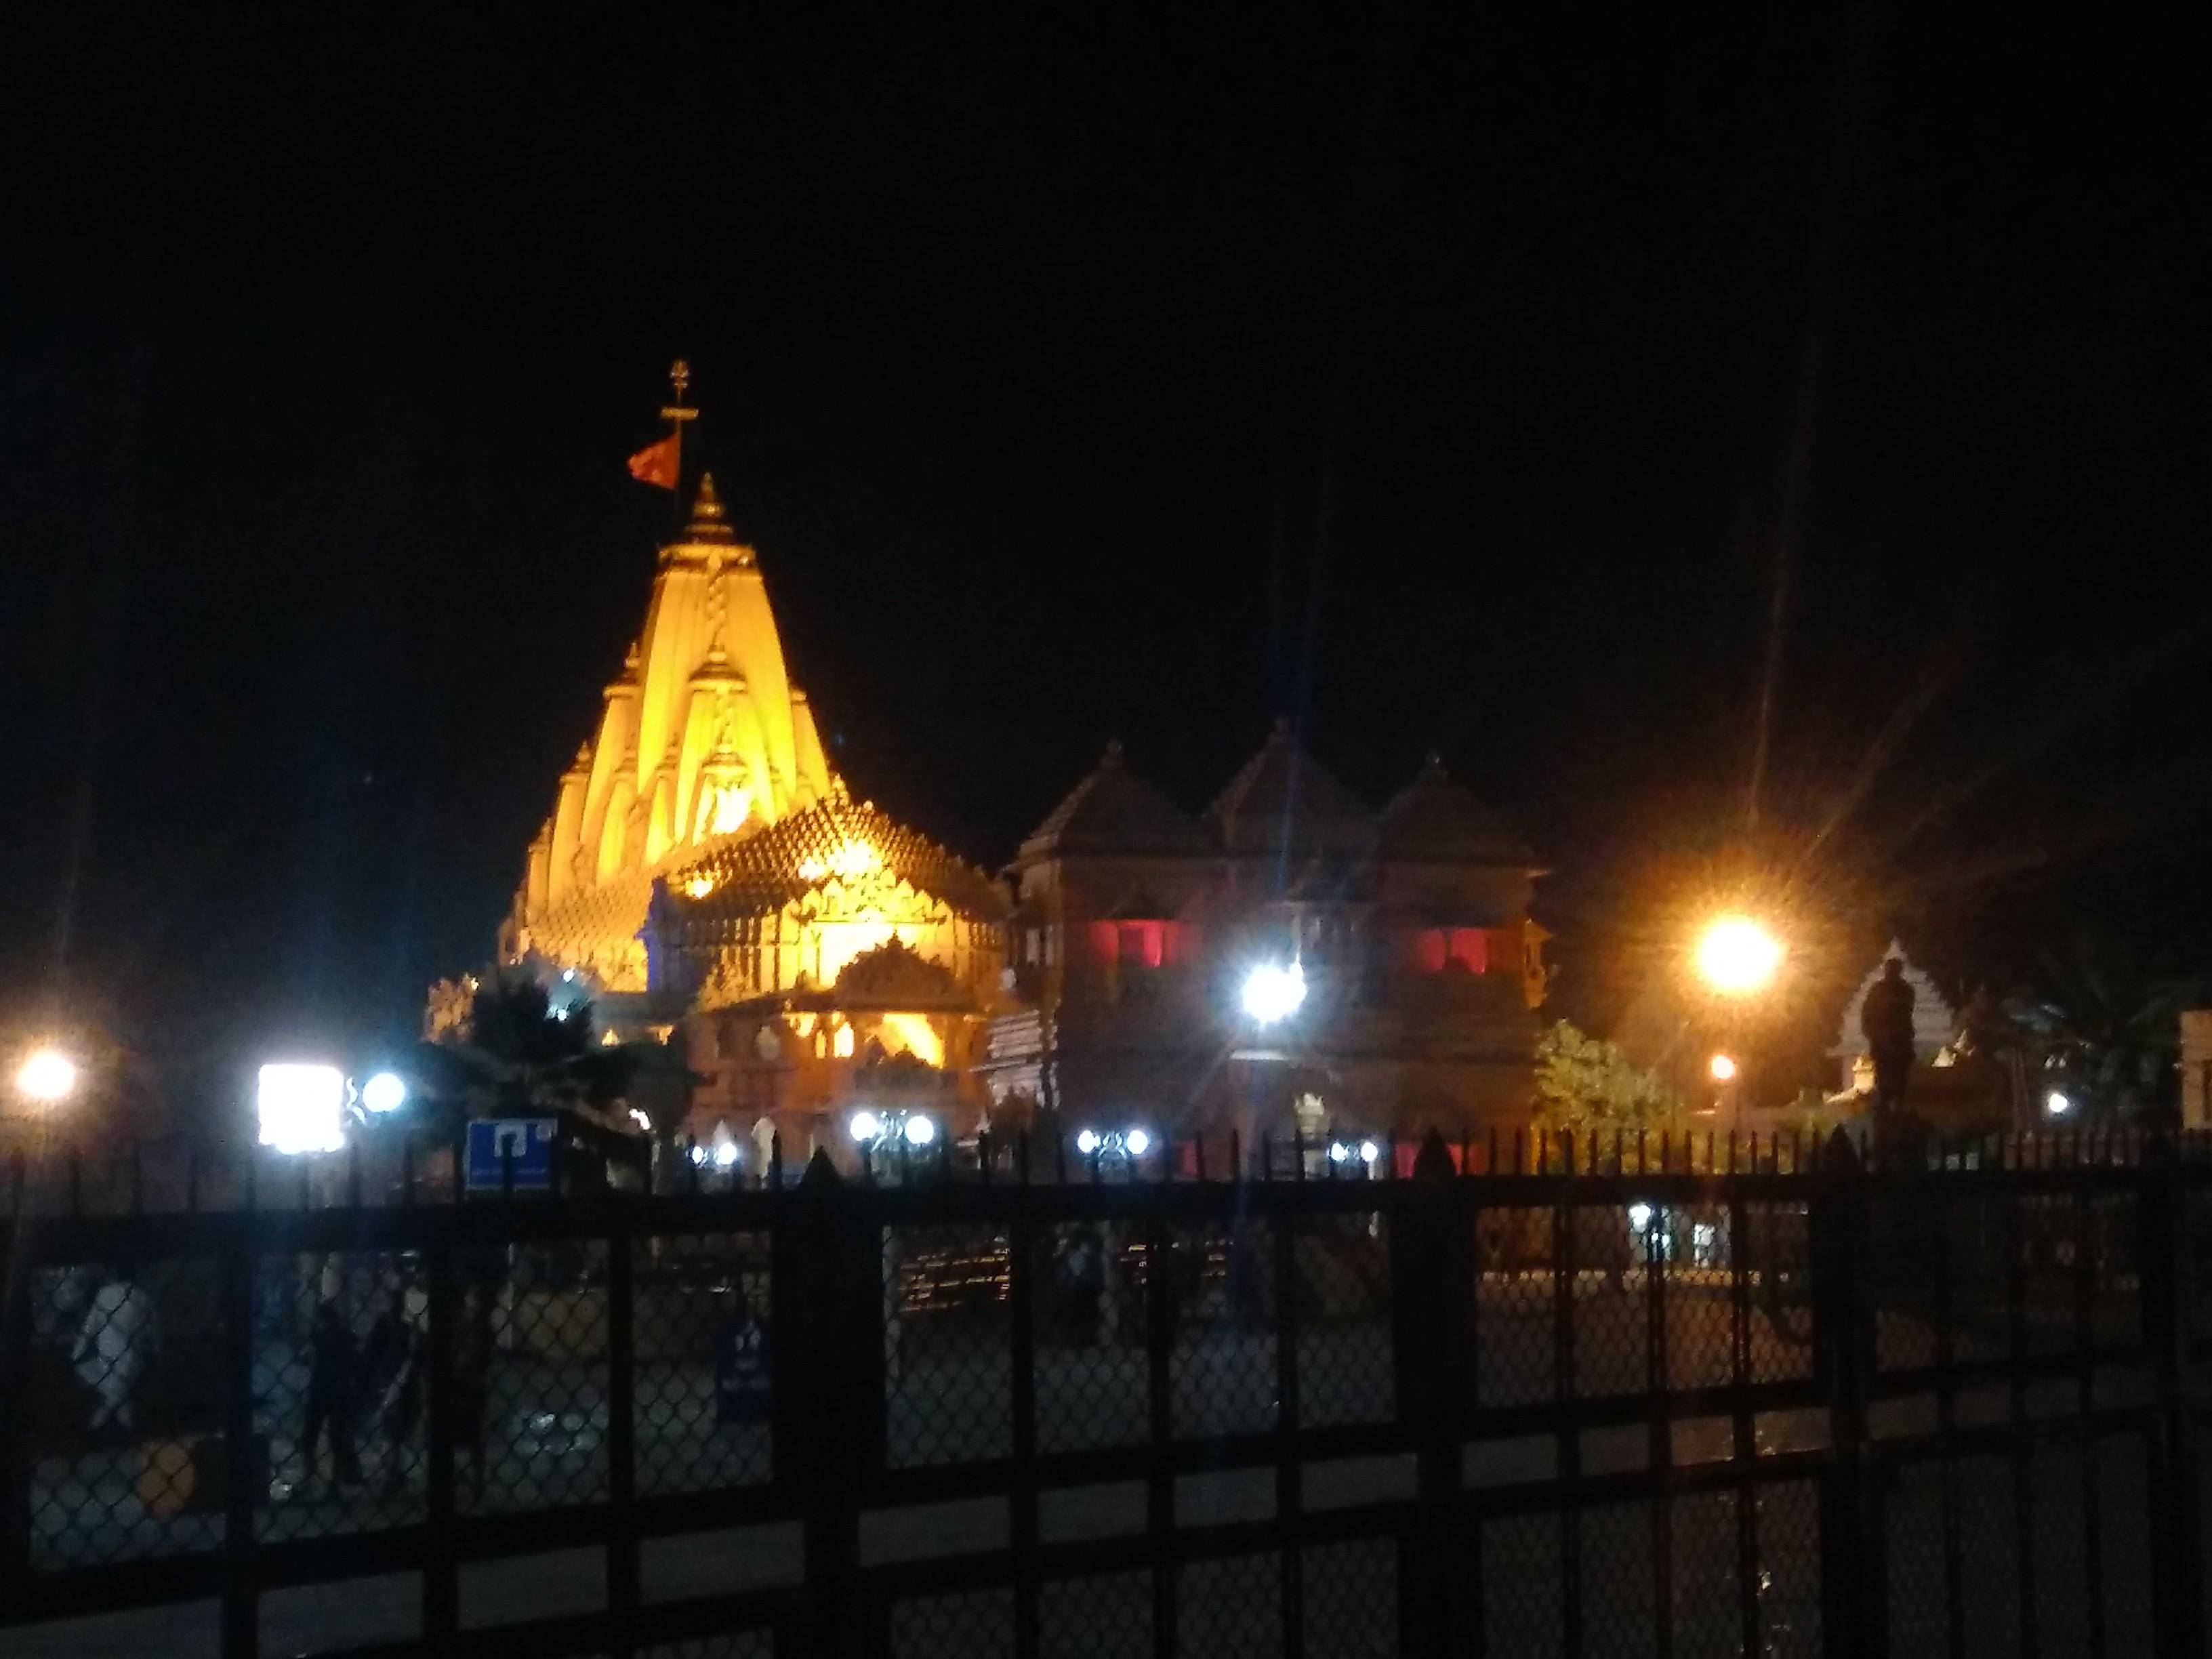 Priyanshu1002